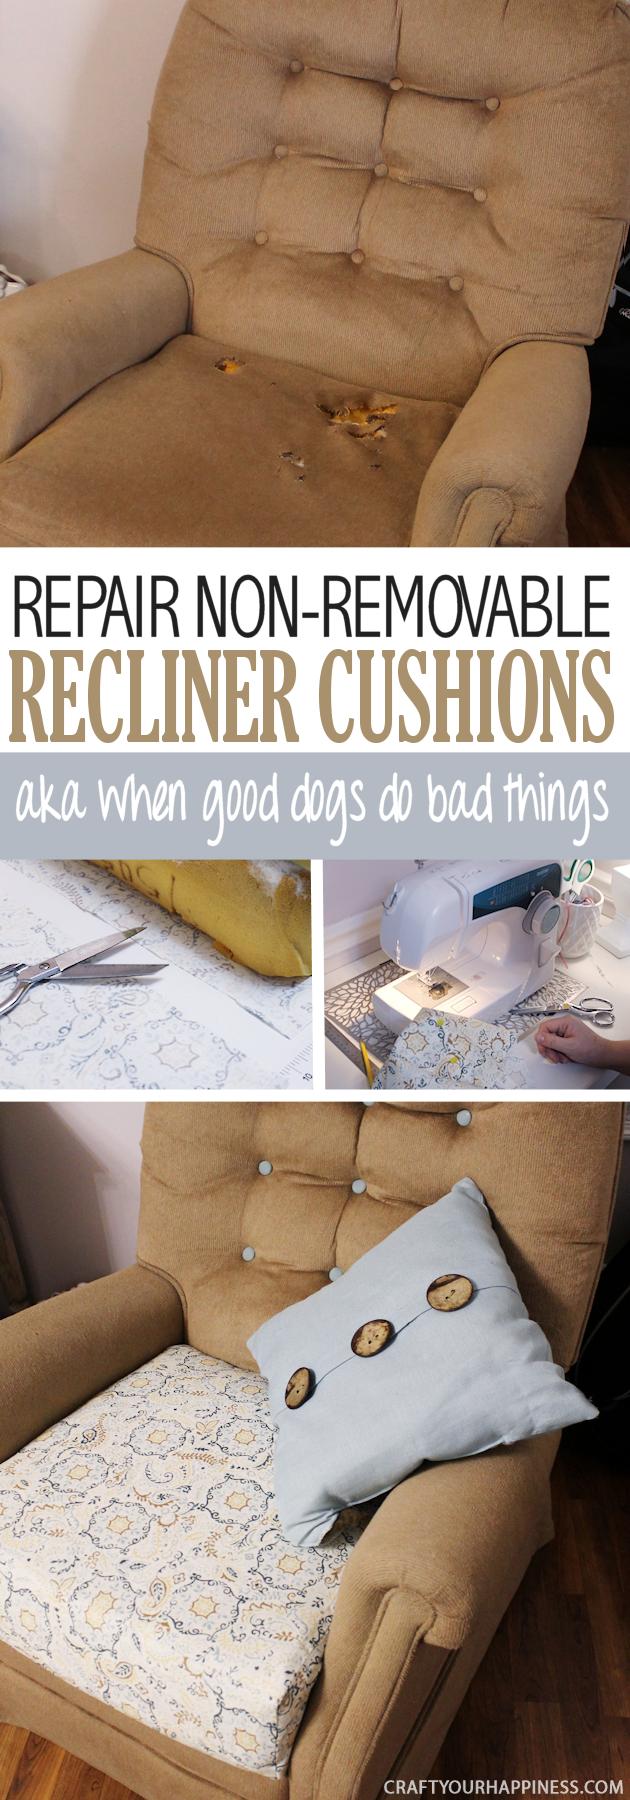 Bad design themen how to repair a recliner cushion aka when good dogs do bad things